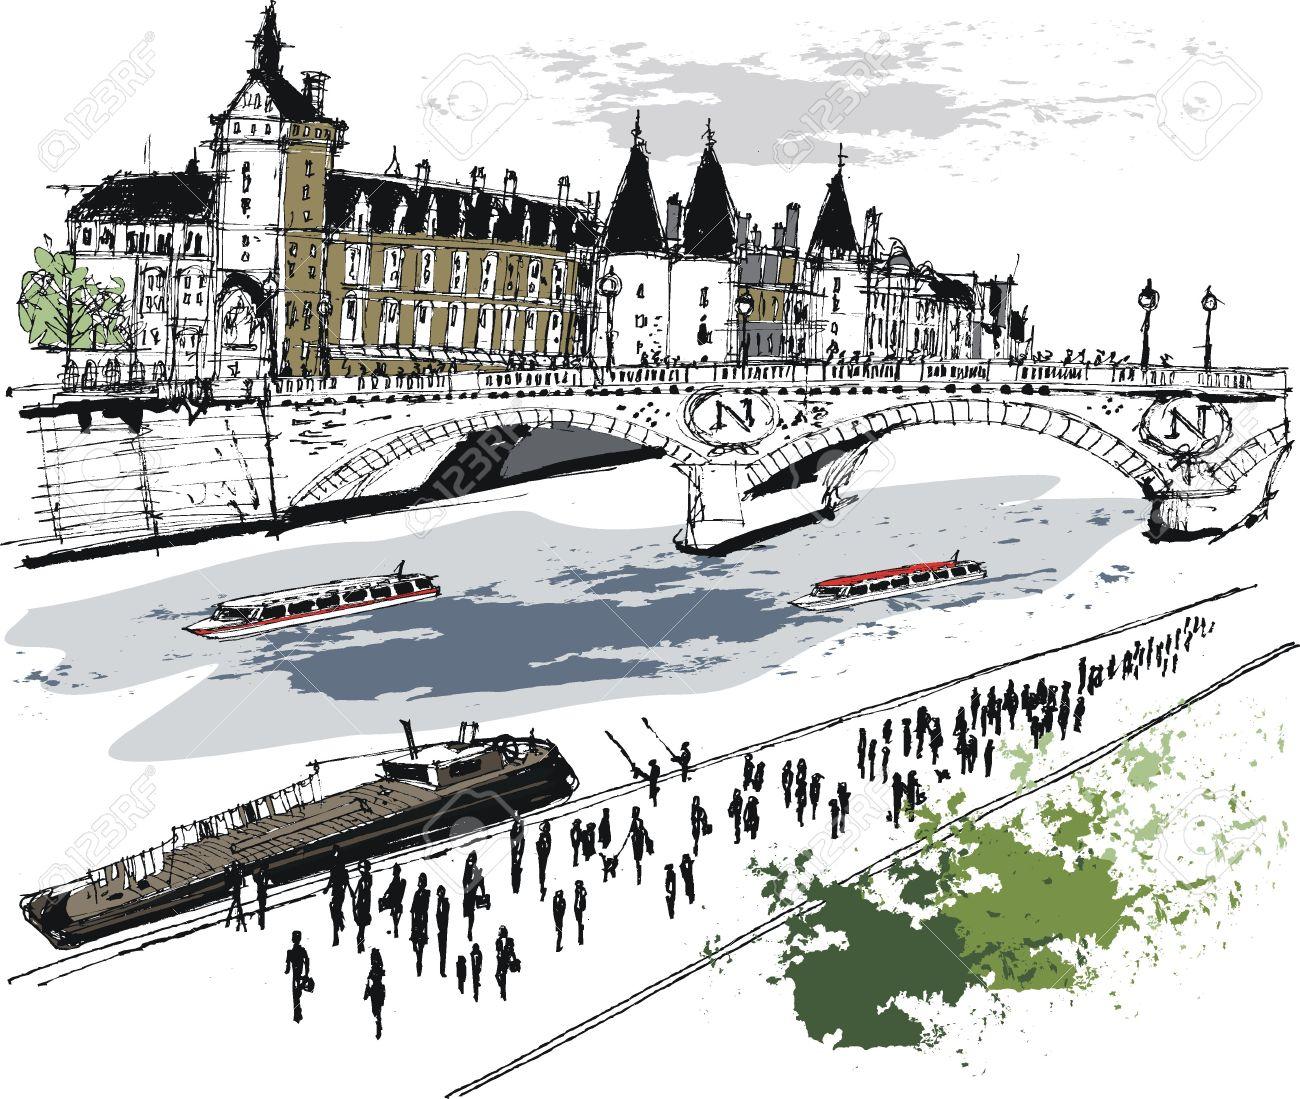 Waterway clipart #6, Download drawings